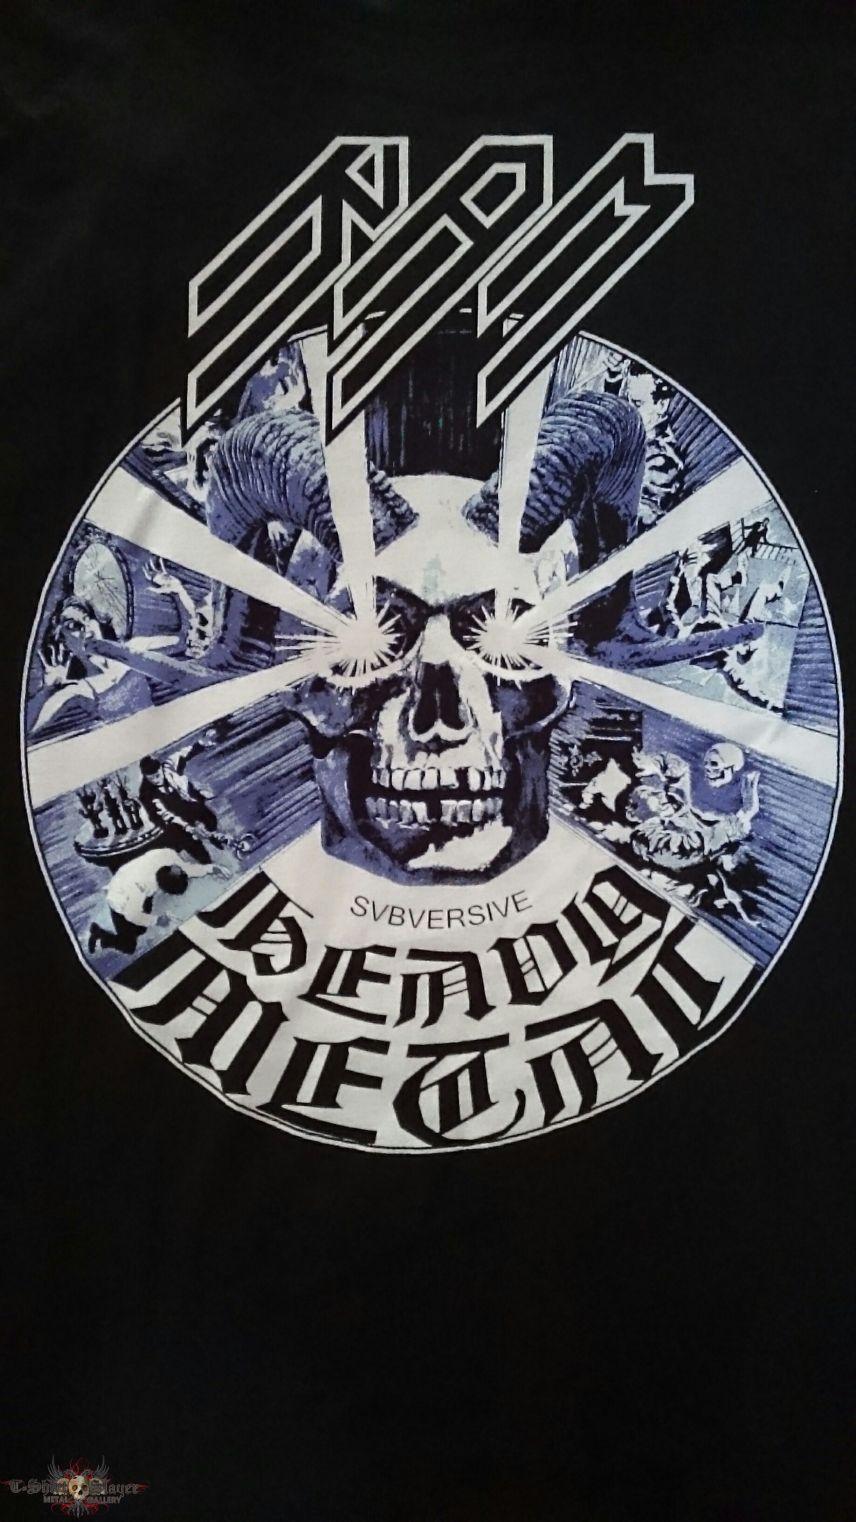 RAM Svbversive Heavy Metal